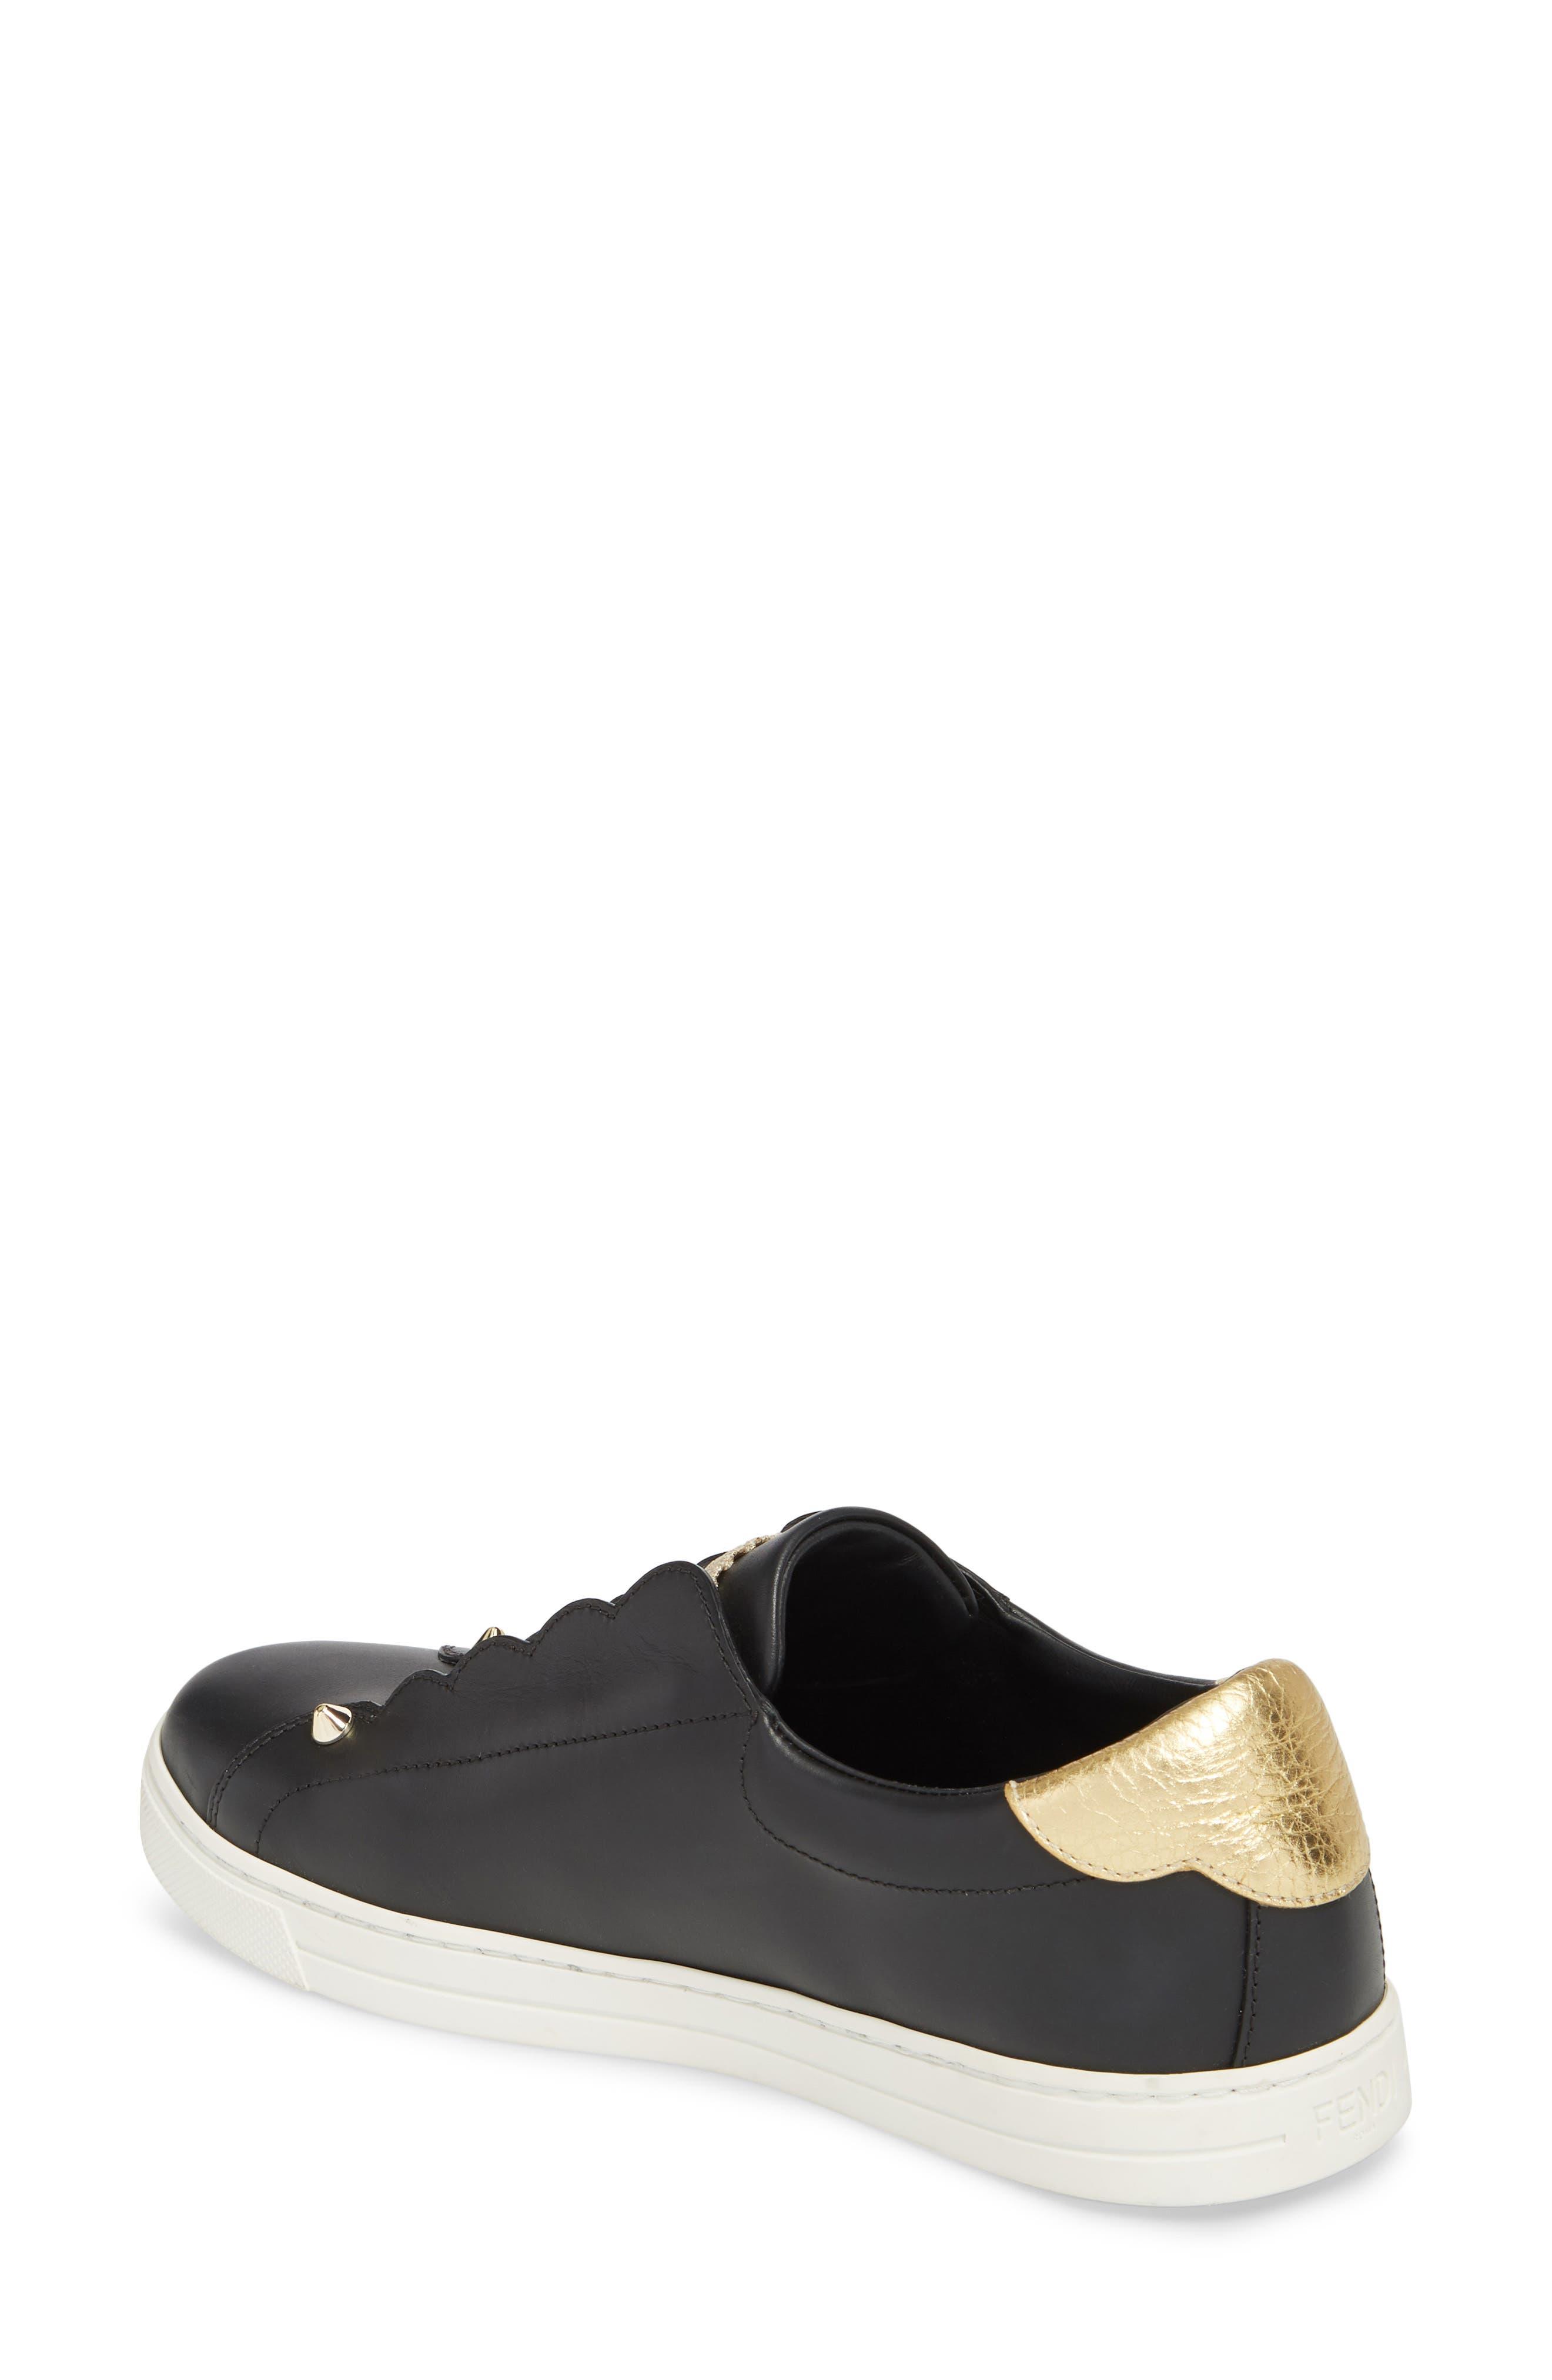 Rockoclick Slip-On Sneaker,                             Alternate thumbnail 2, color,                             BLACK